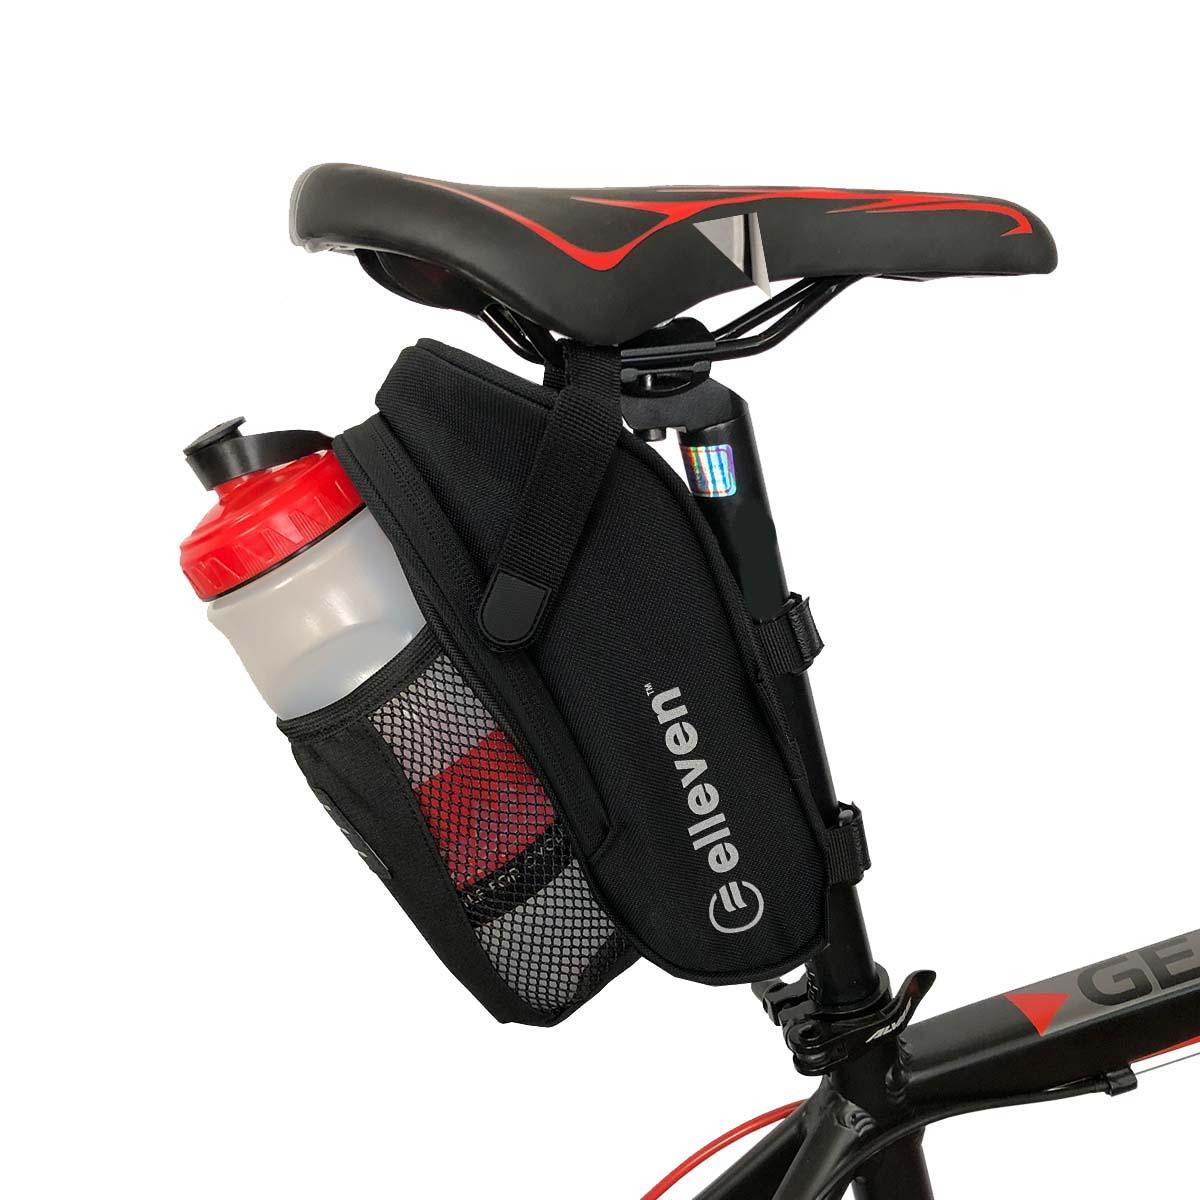 Bolsa De Selim Bike Elleven Com Bolso Para Garrafa